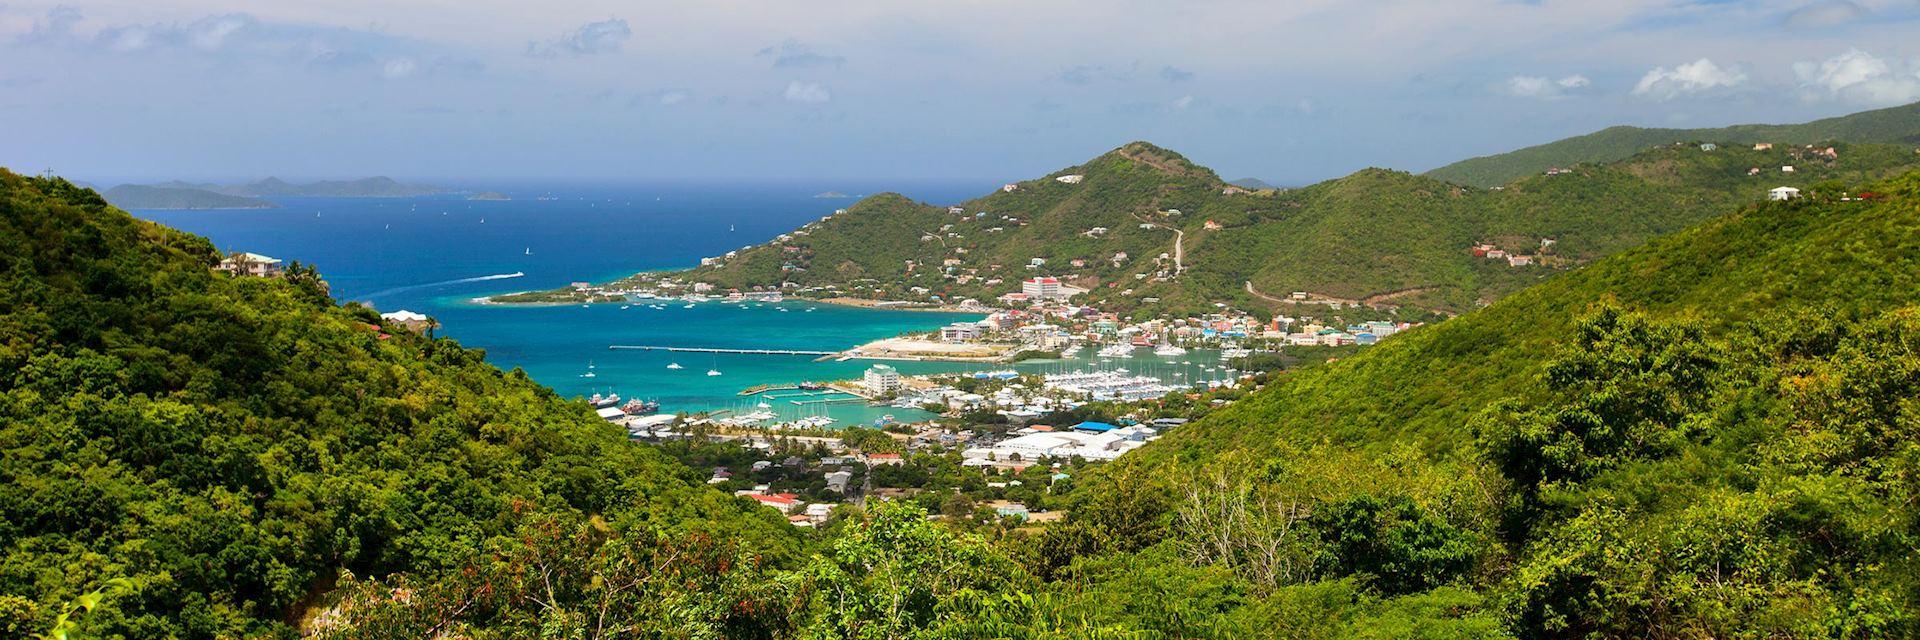 Tortola coastline, British Virgin Islands